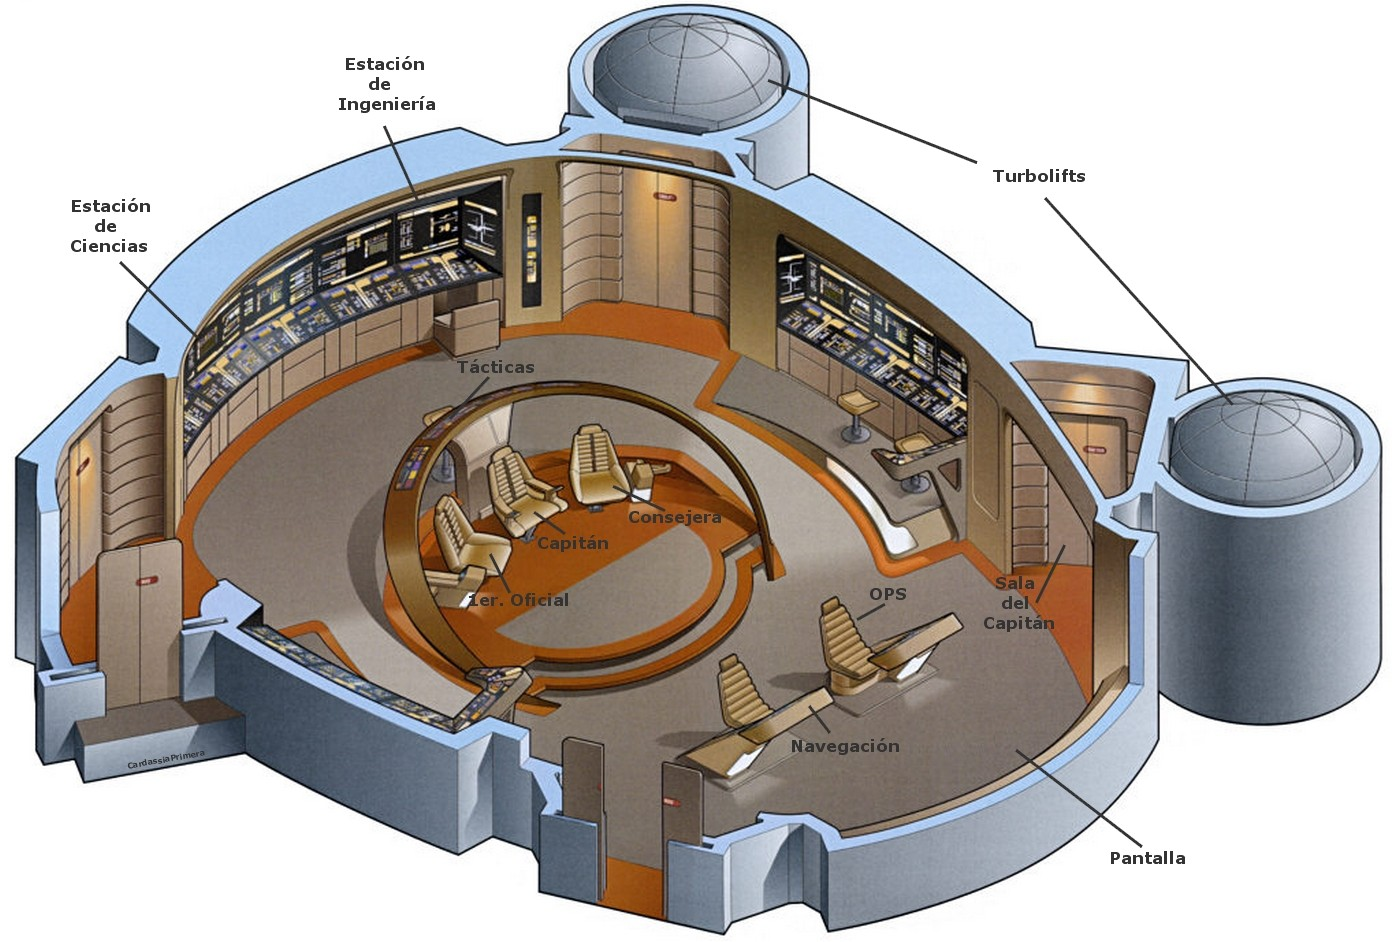 uss enterprise diagram audi a4 1 8 t engine star trek starships bridges interiors schematics blueprints